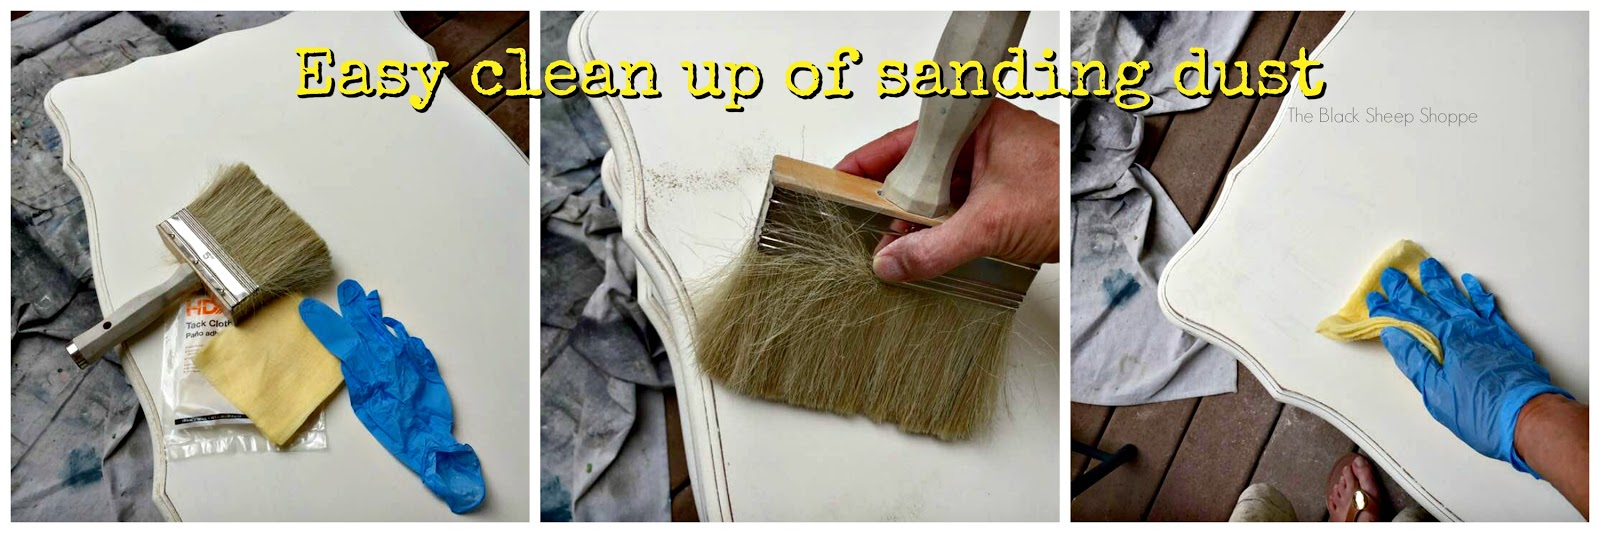 Easy clean up of sanding dust.